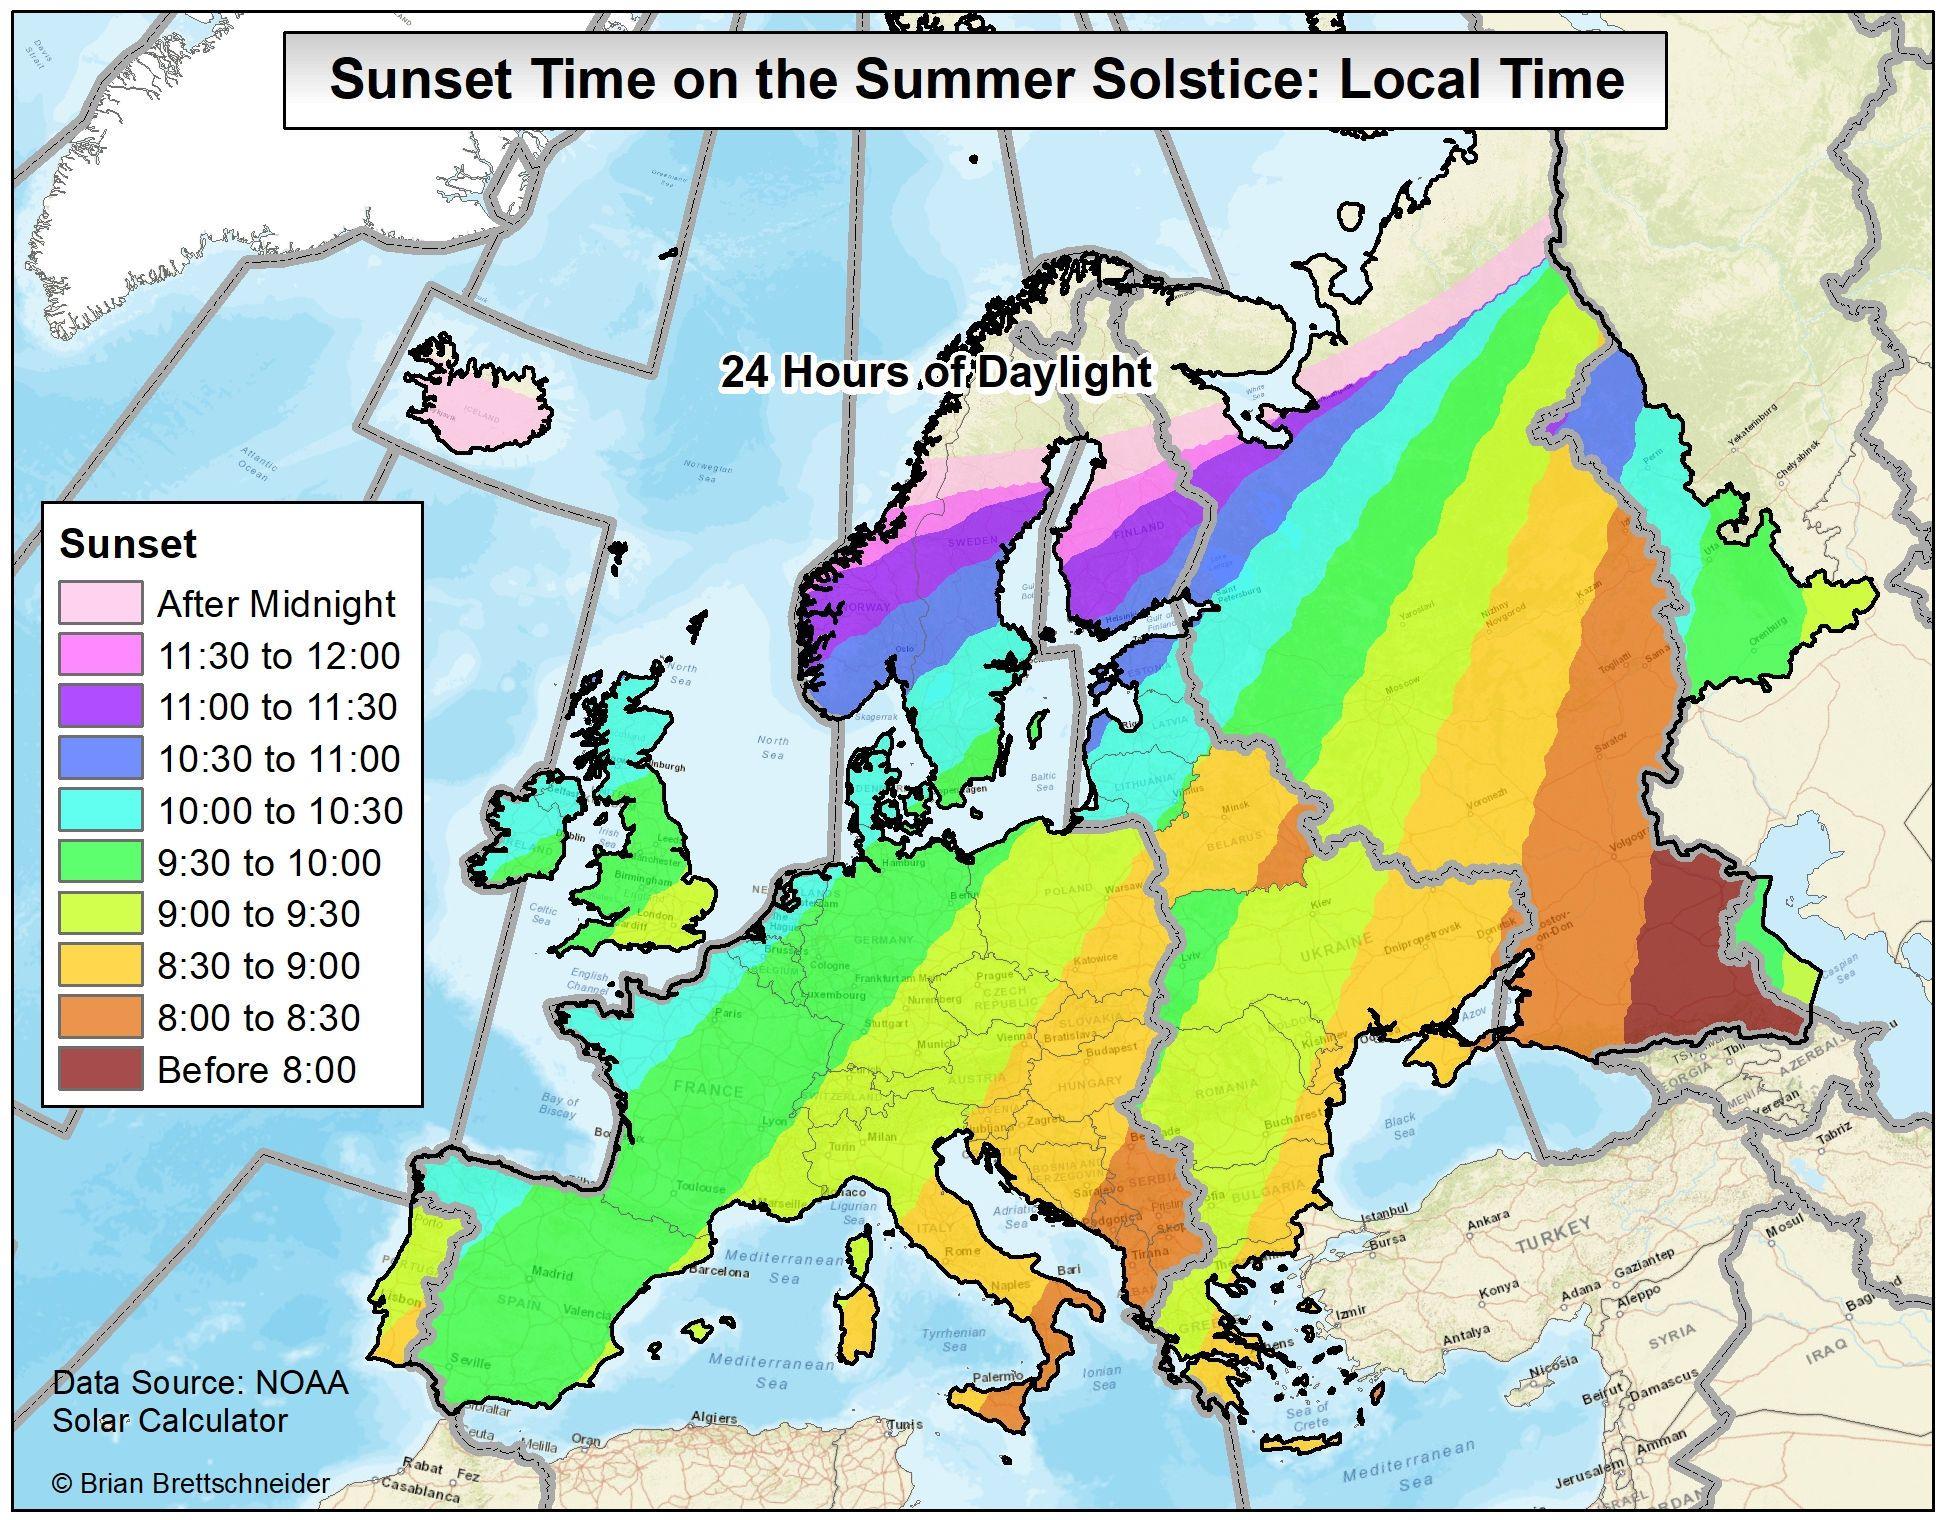 Sunset on summer solstice in Europe  MAPS  Pinterest  Summer